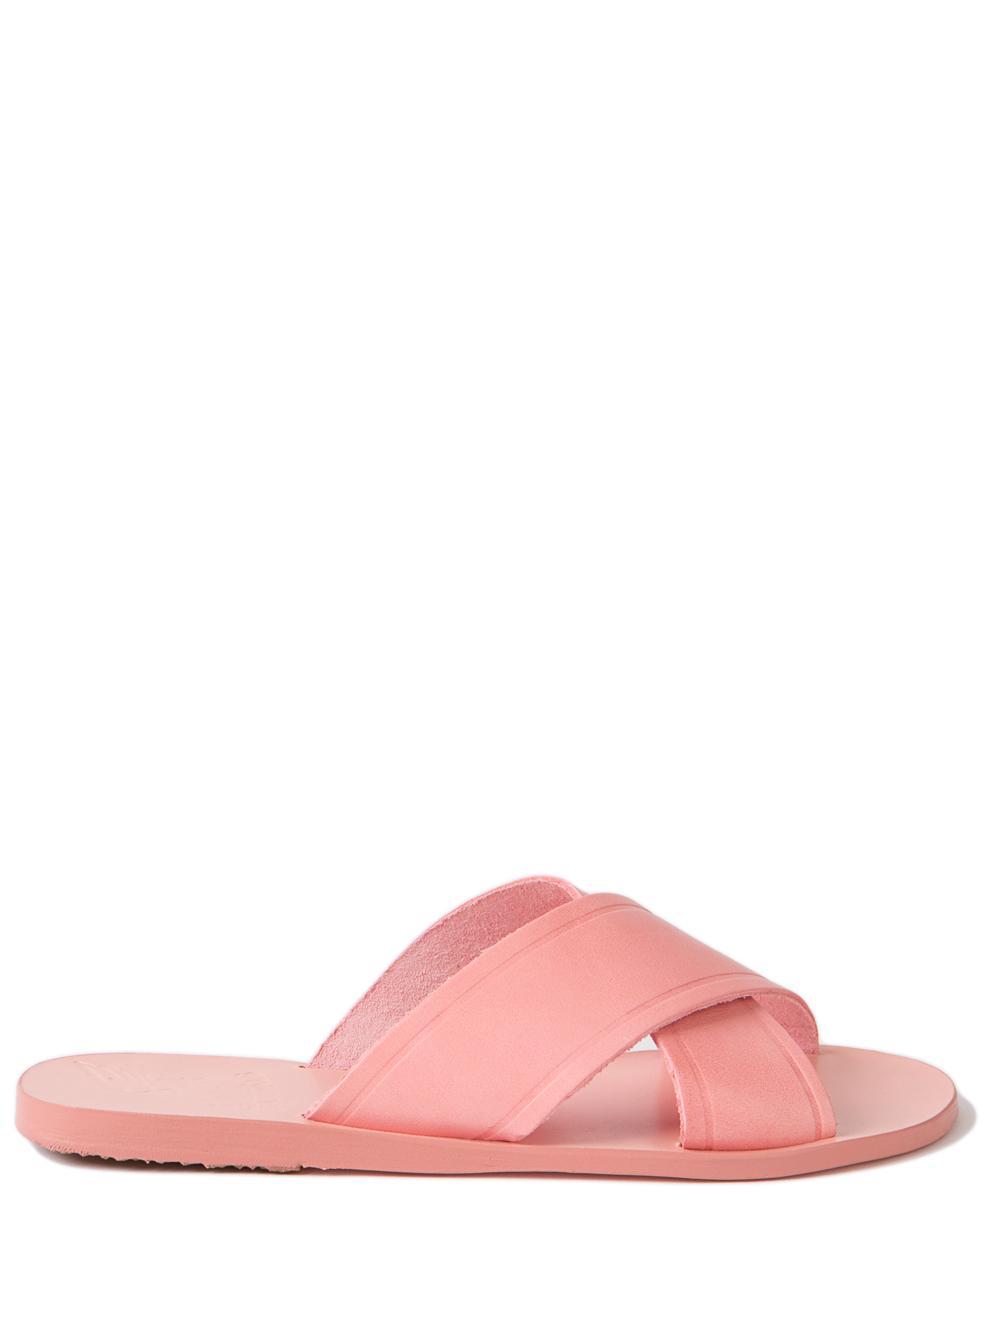 Thais sandals - Pink & Purple Ancient Greek Sandals GbVuGhvQlg